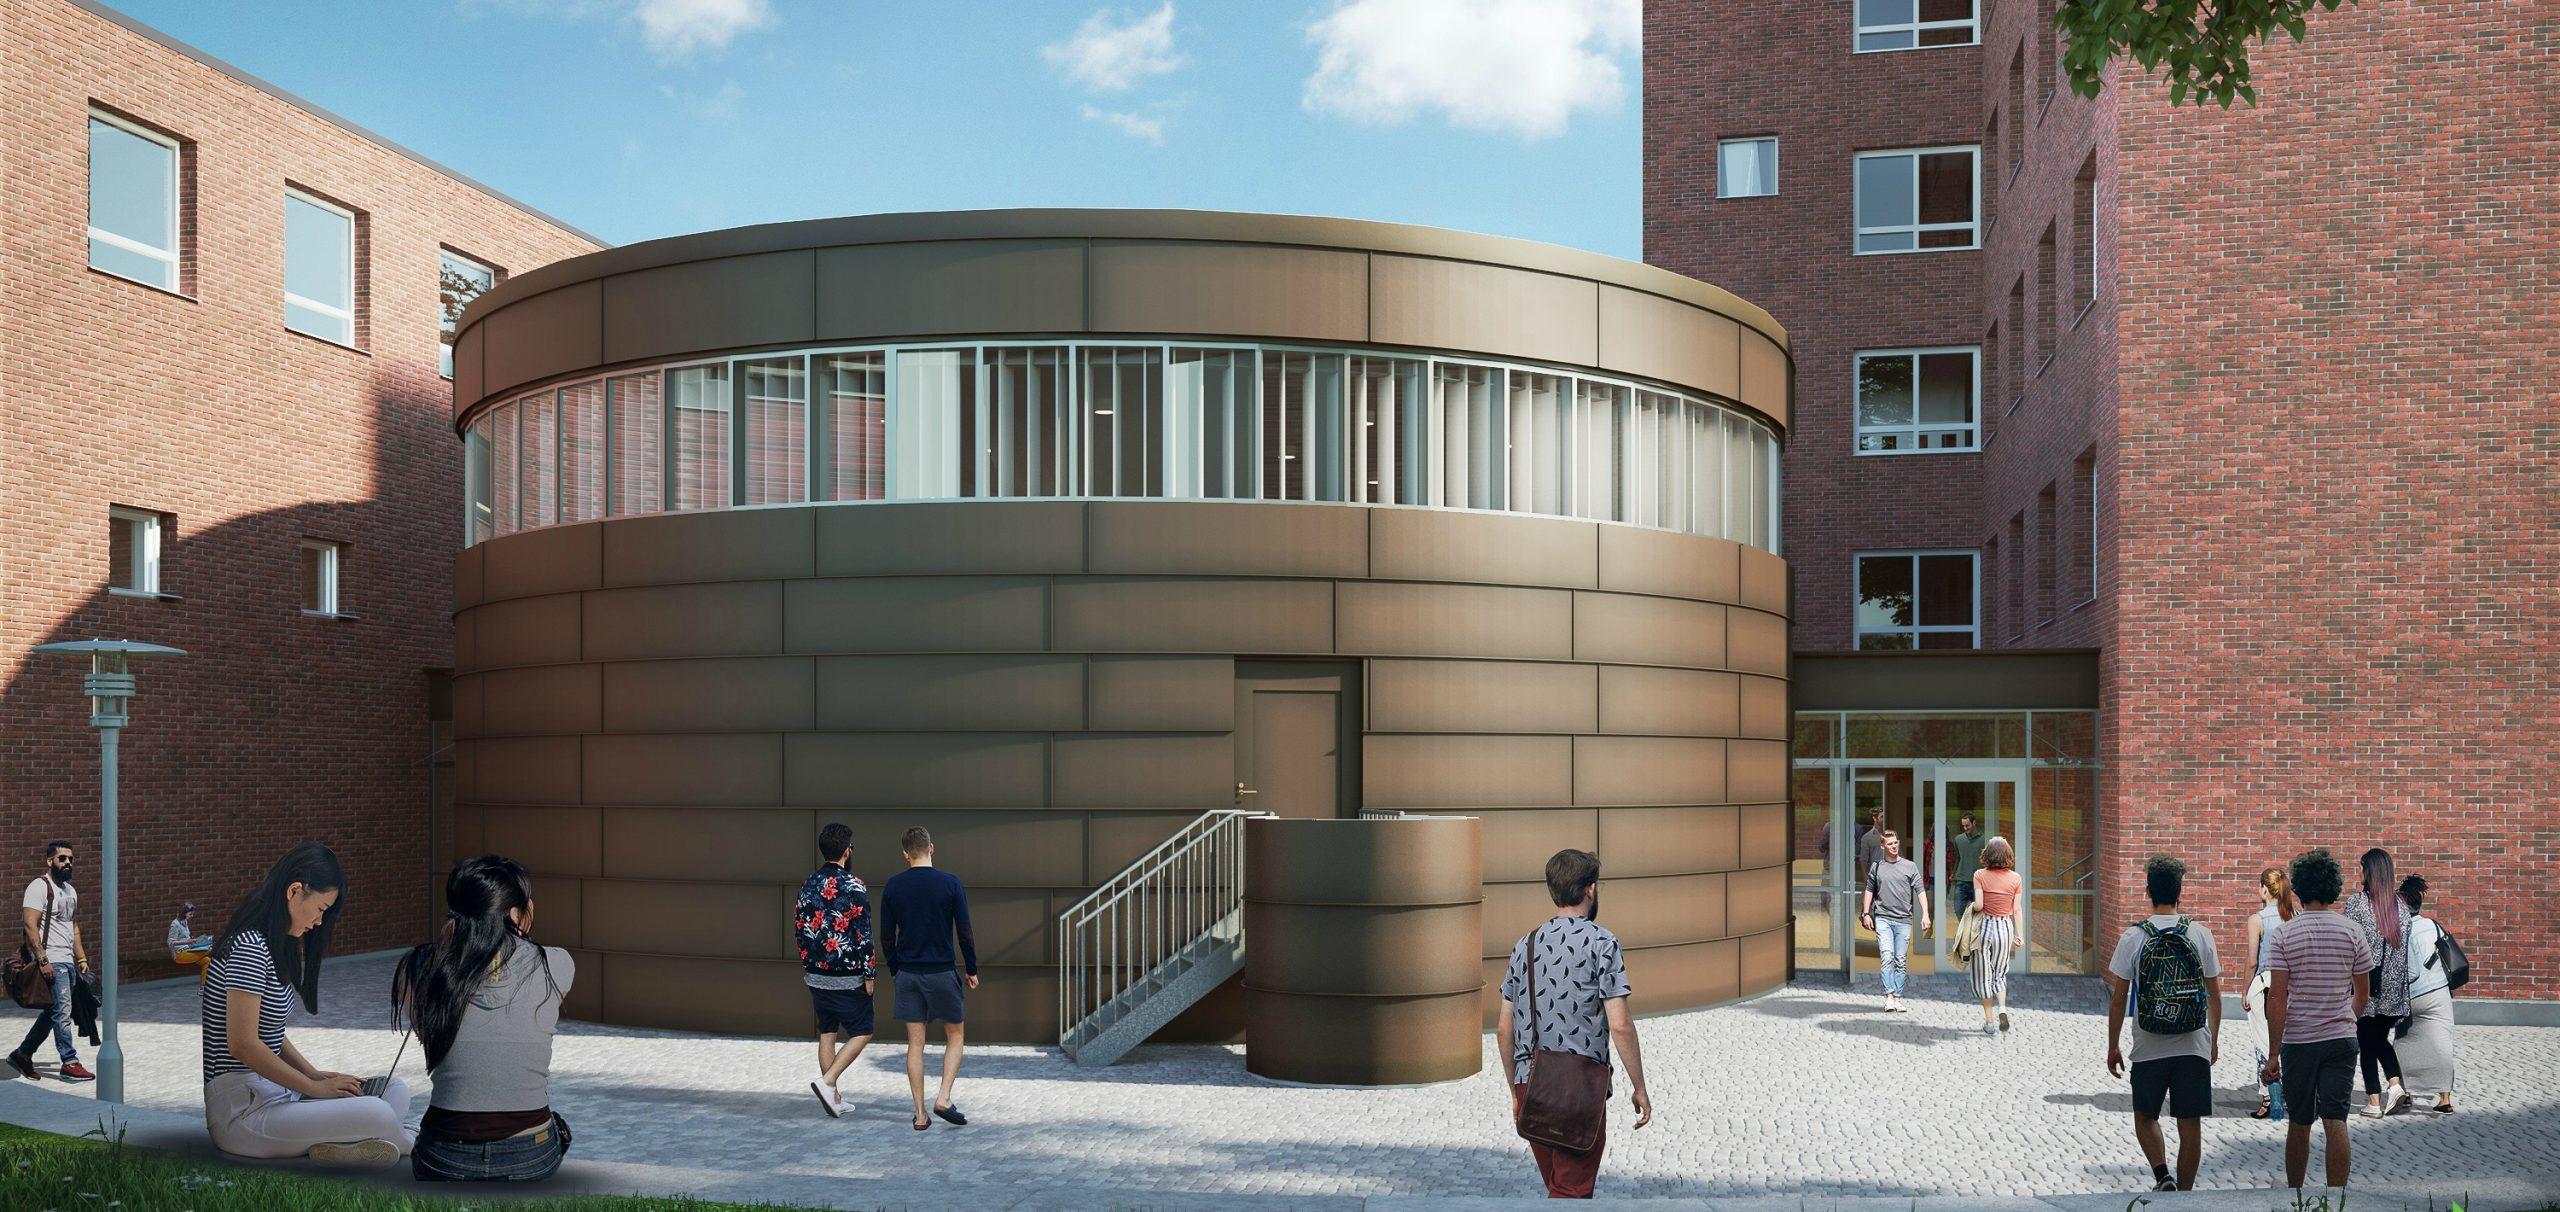 M-huset, Teknodromen Lunds Tekniska Högskola